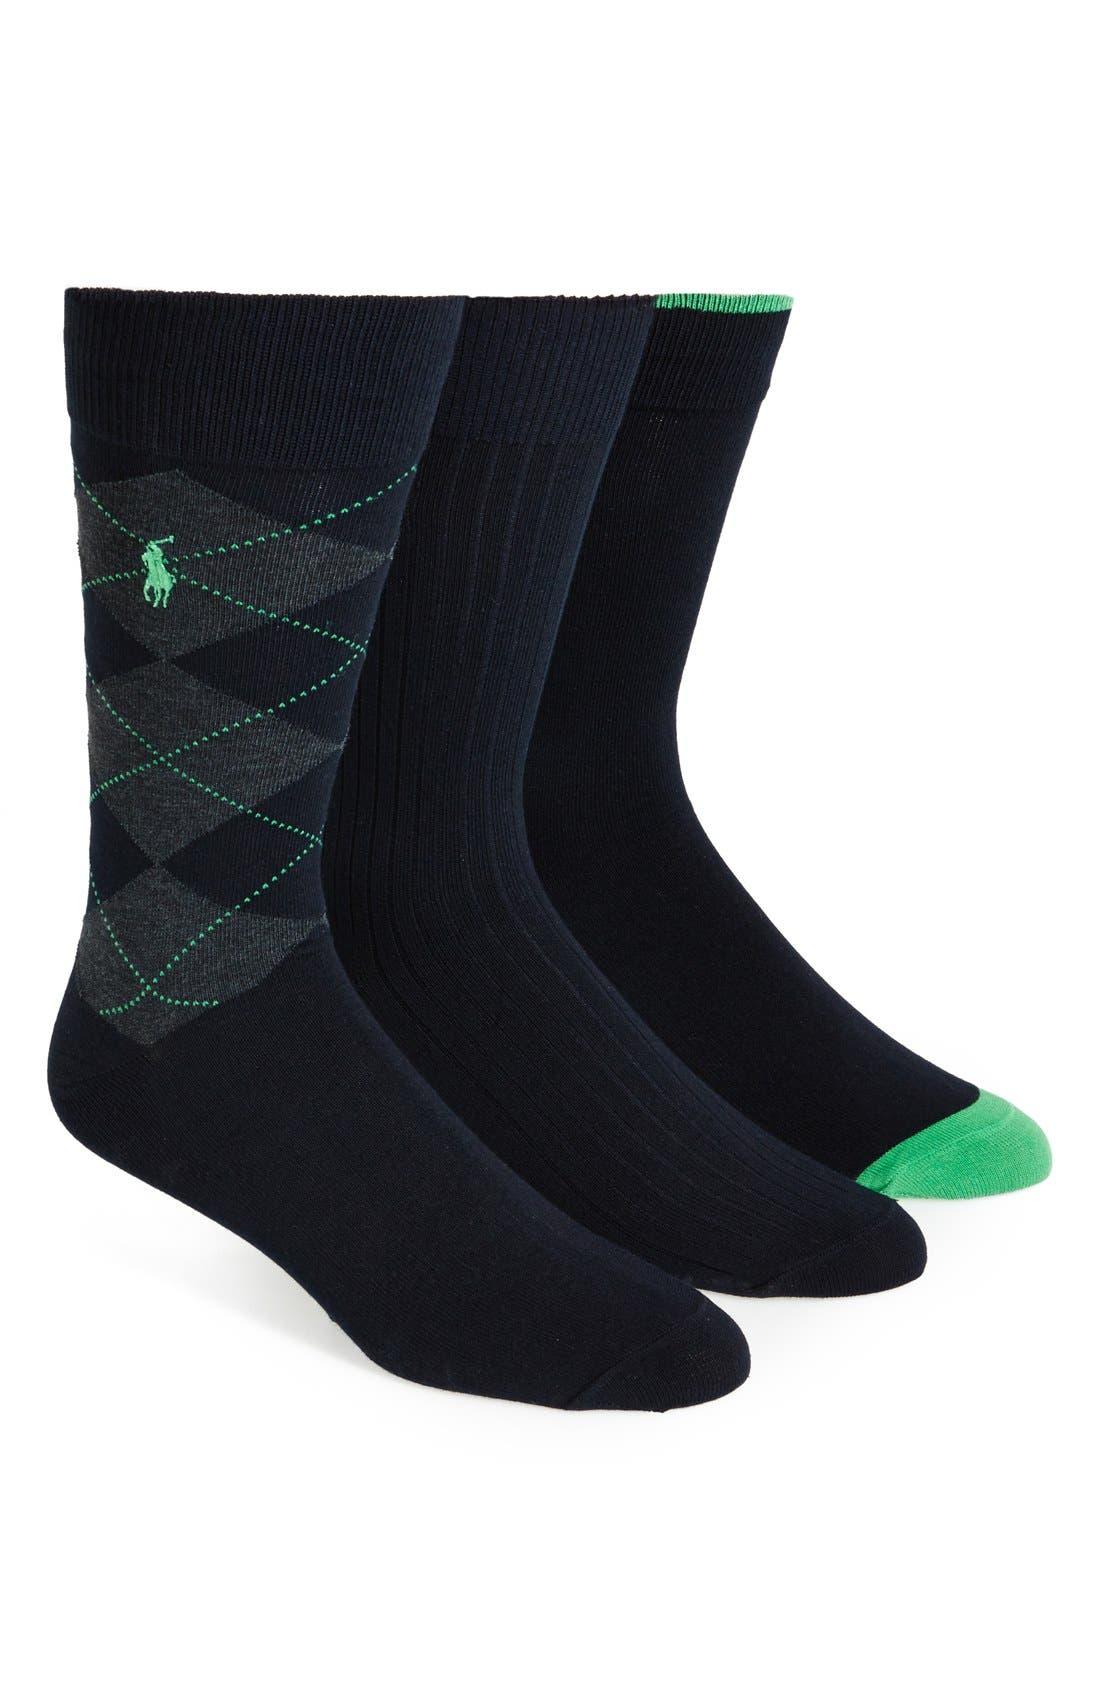 Main Image - Polo Ralph Lauren Cotton Blend Socks (3-Pack)